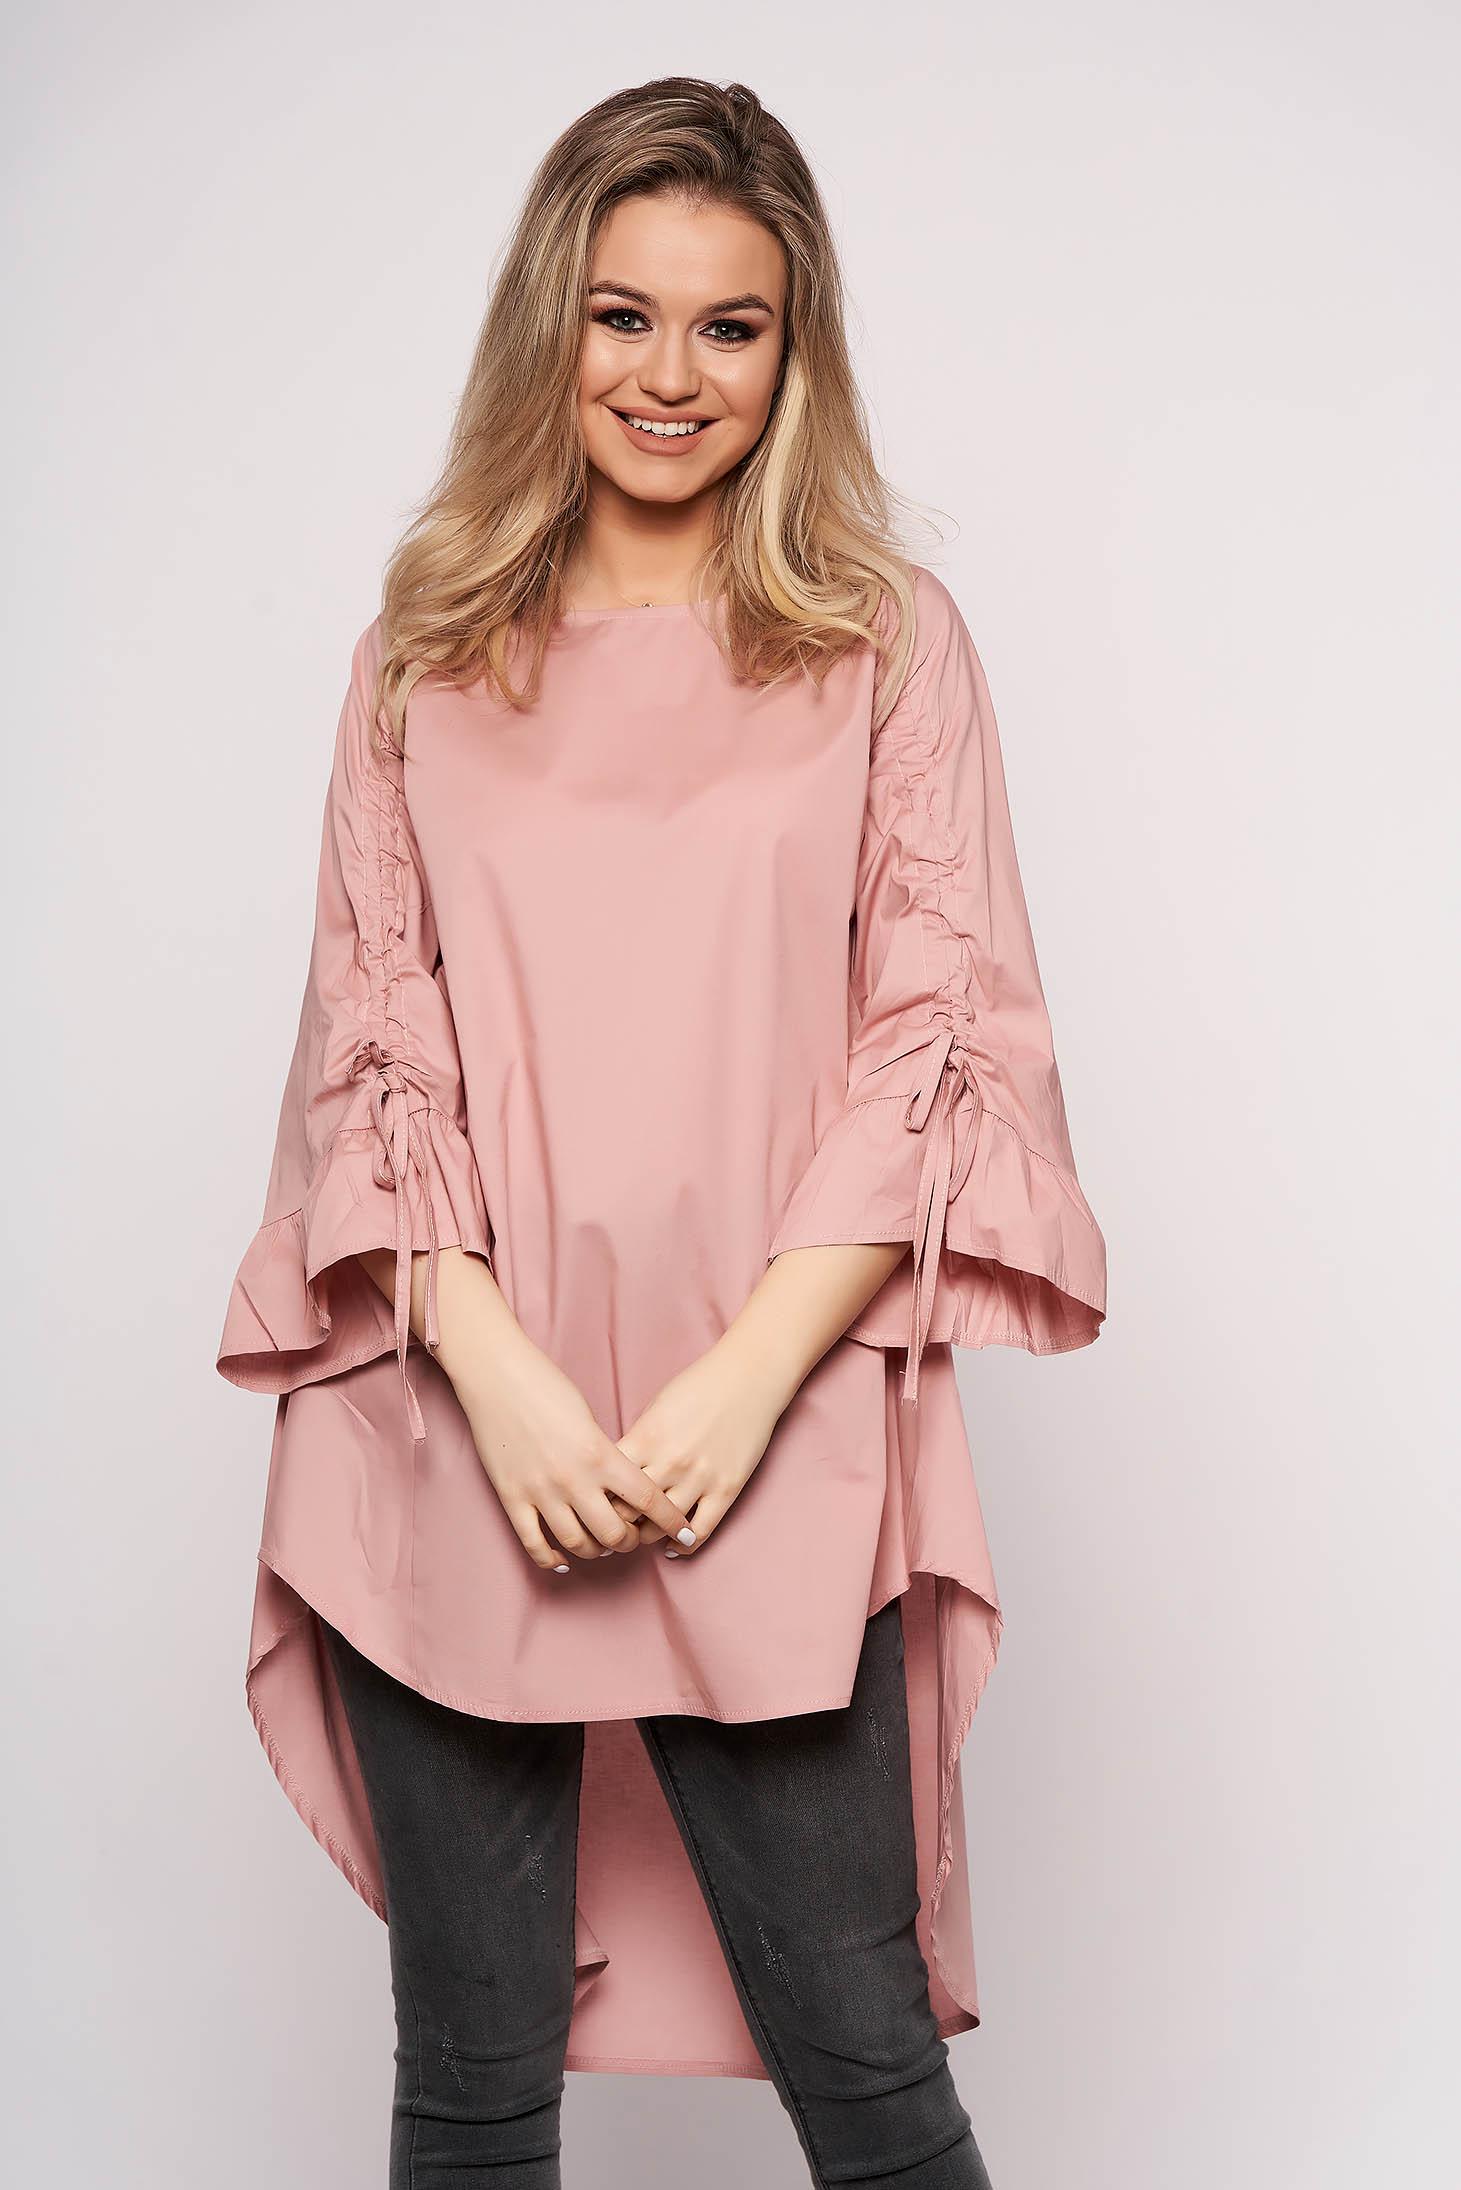 Camasa SunShine roz prafuit casual asimetrica din bumbac cu croi in a si maneca trei sferturi